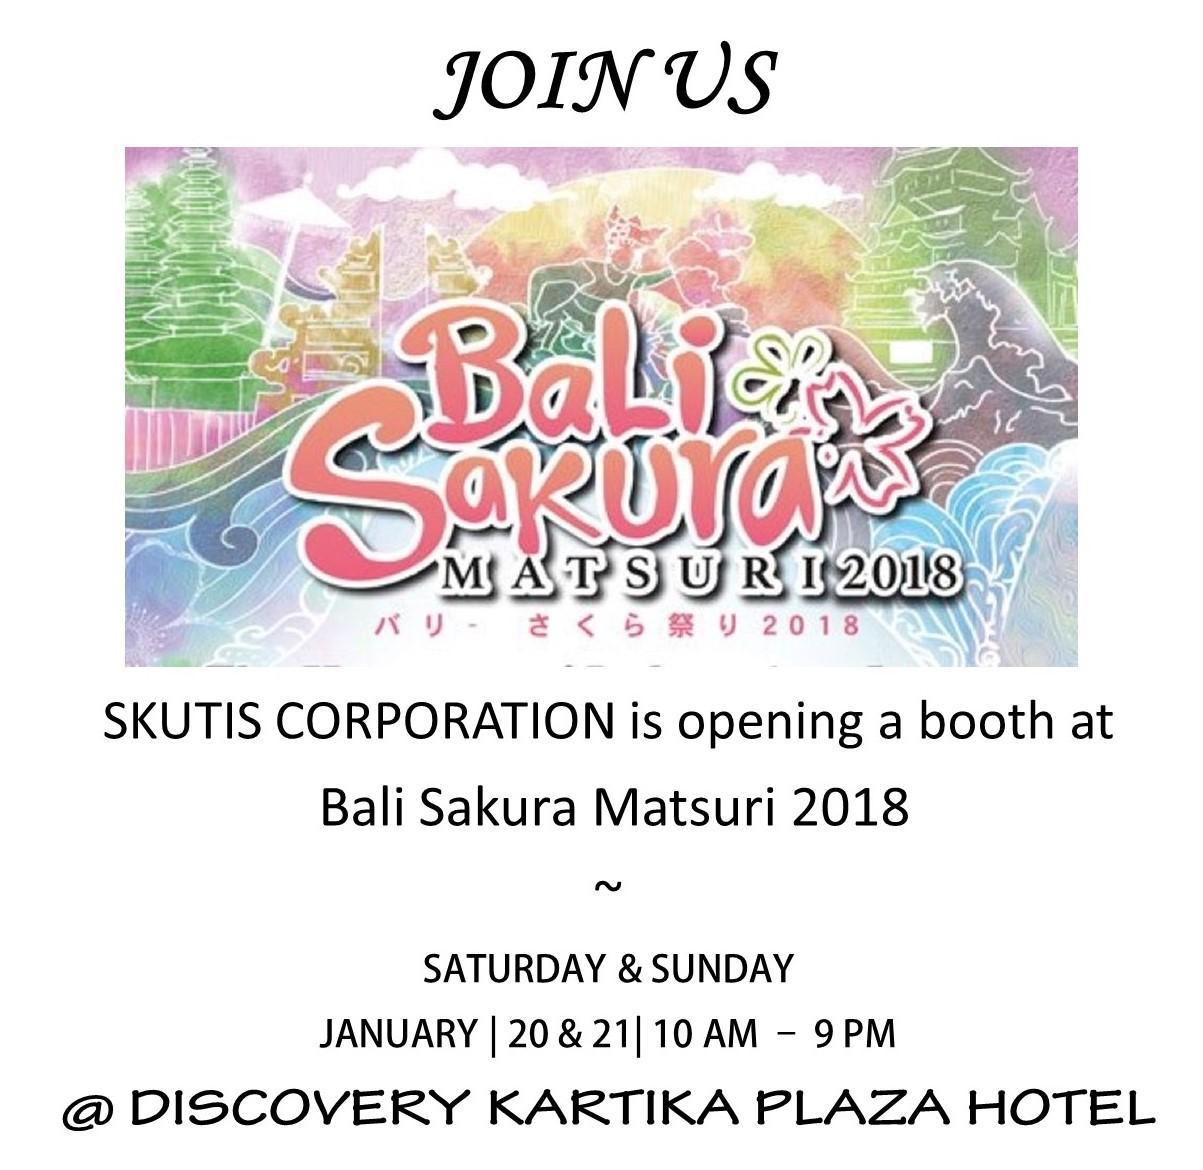 WhatsApp Image 2018 01 19 at 6.32.46 PM - Skutis Corporation Today and Tomorrow At Discovery Kartika Plaza Hotel